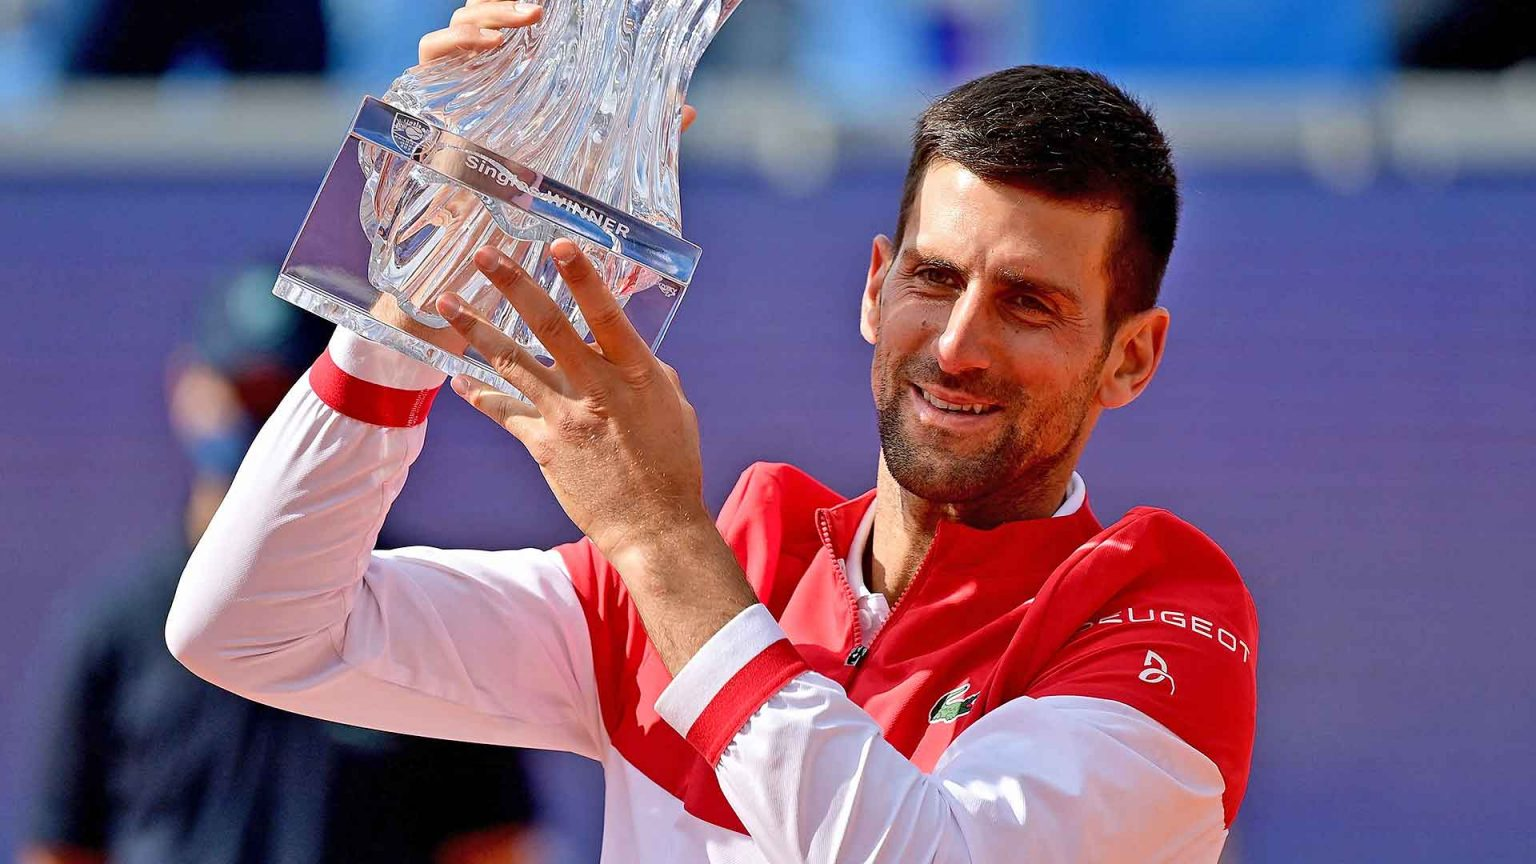 Djokovic Wins 83rd Career Title In Belgrade open | ബെൽഗ്രേഡിൽ ജോക്കോവിച്ച് 83-ാമത് കരിയർ ടൈറ്റിൽ നേടി_40.1